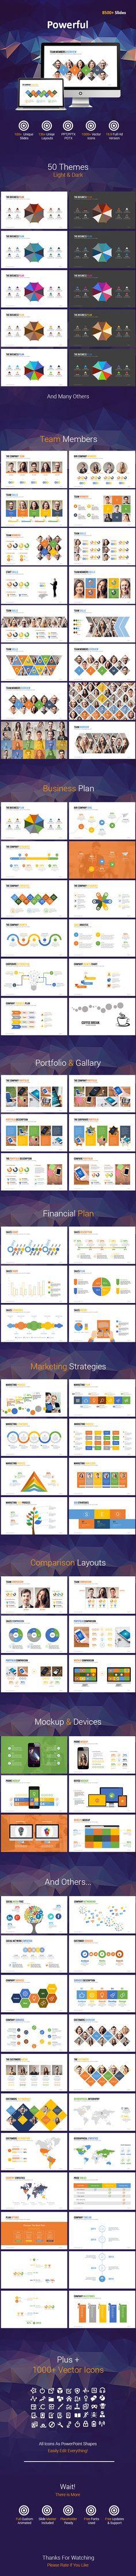 Prospective Business Presentation  Business Presentation